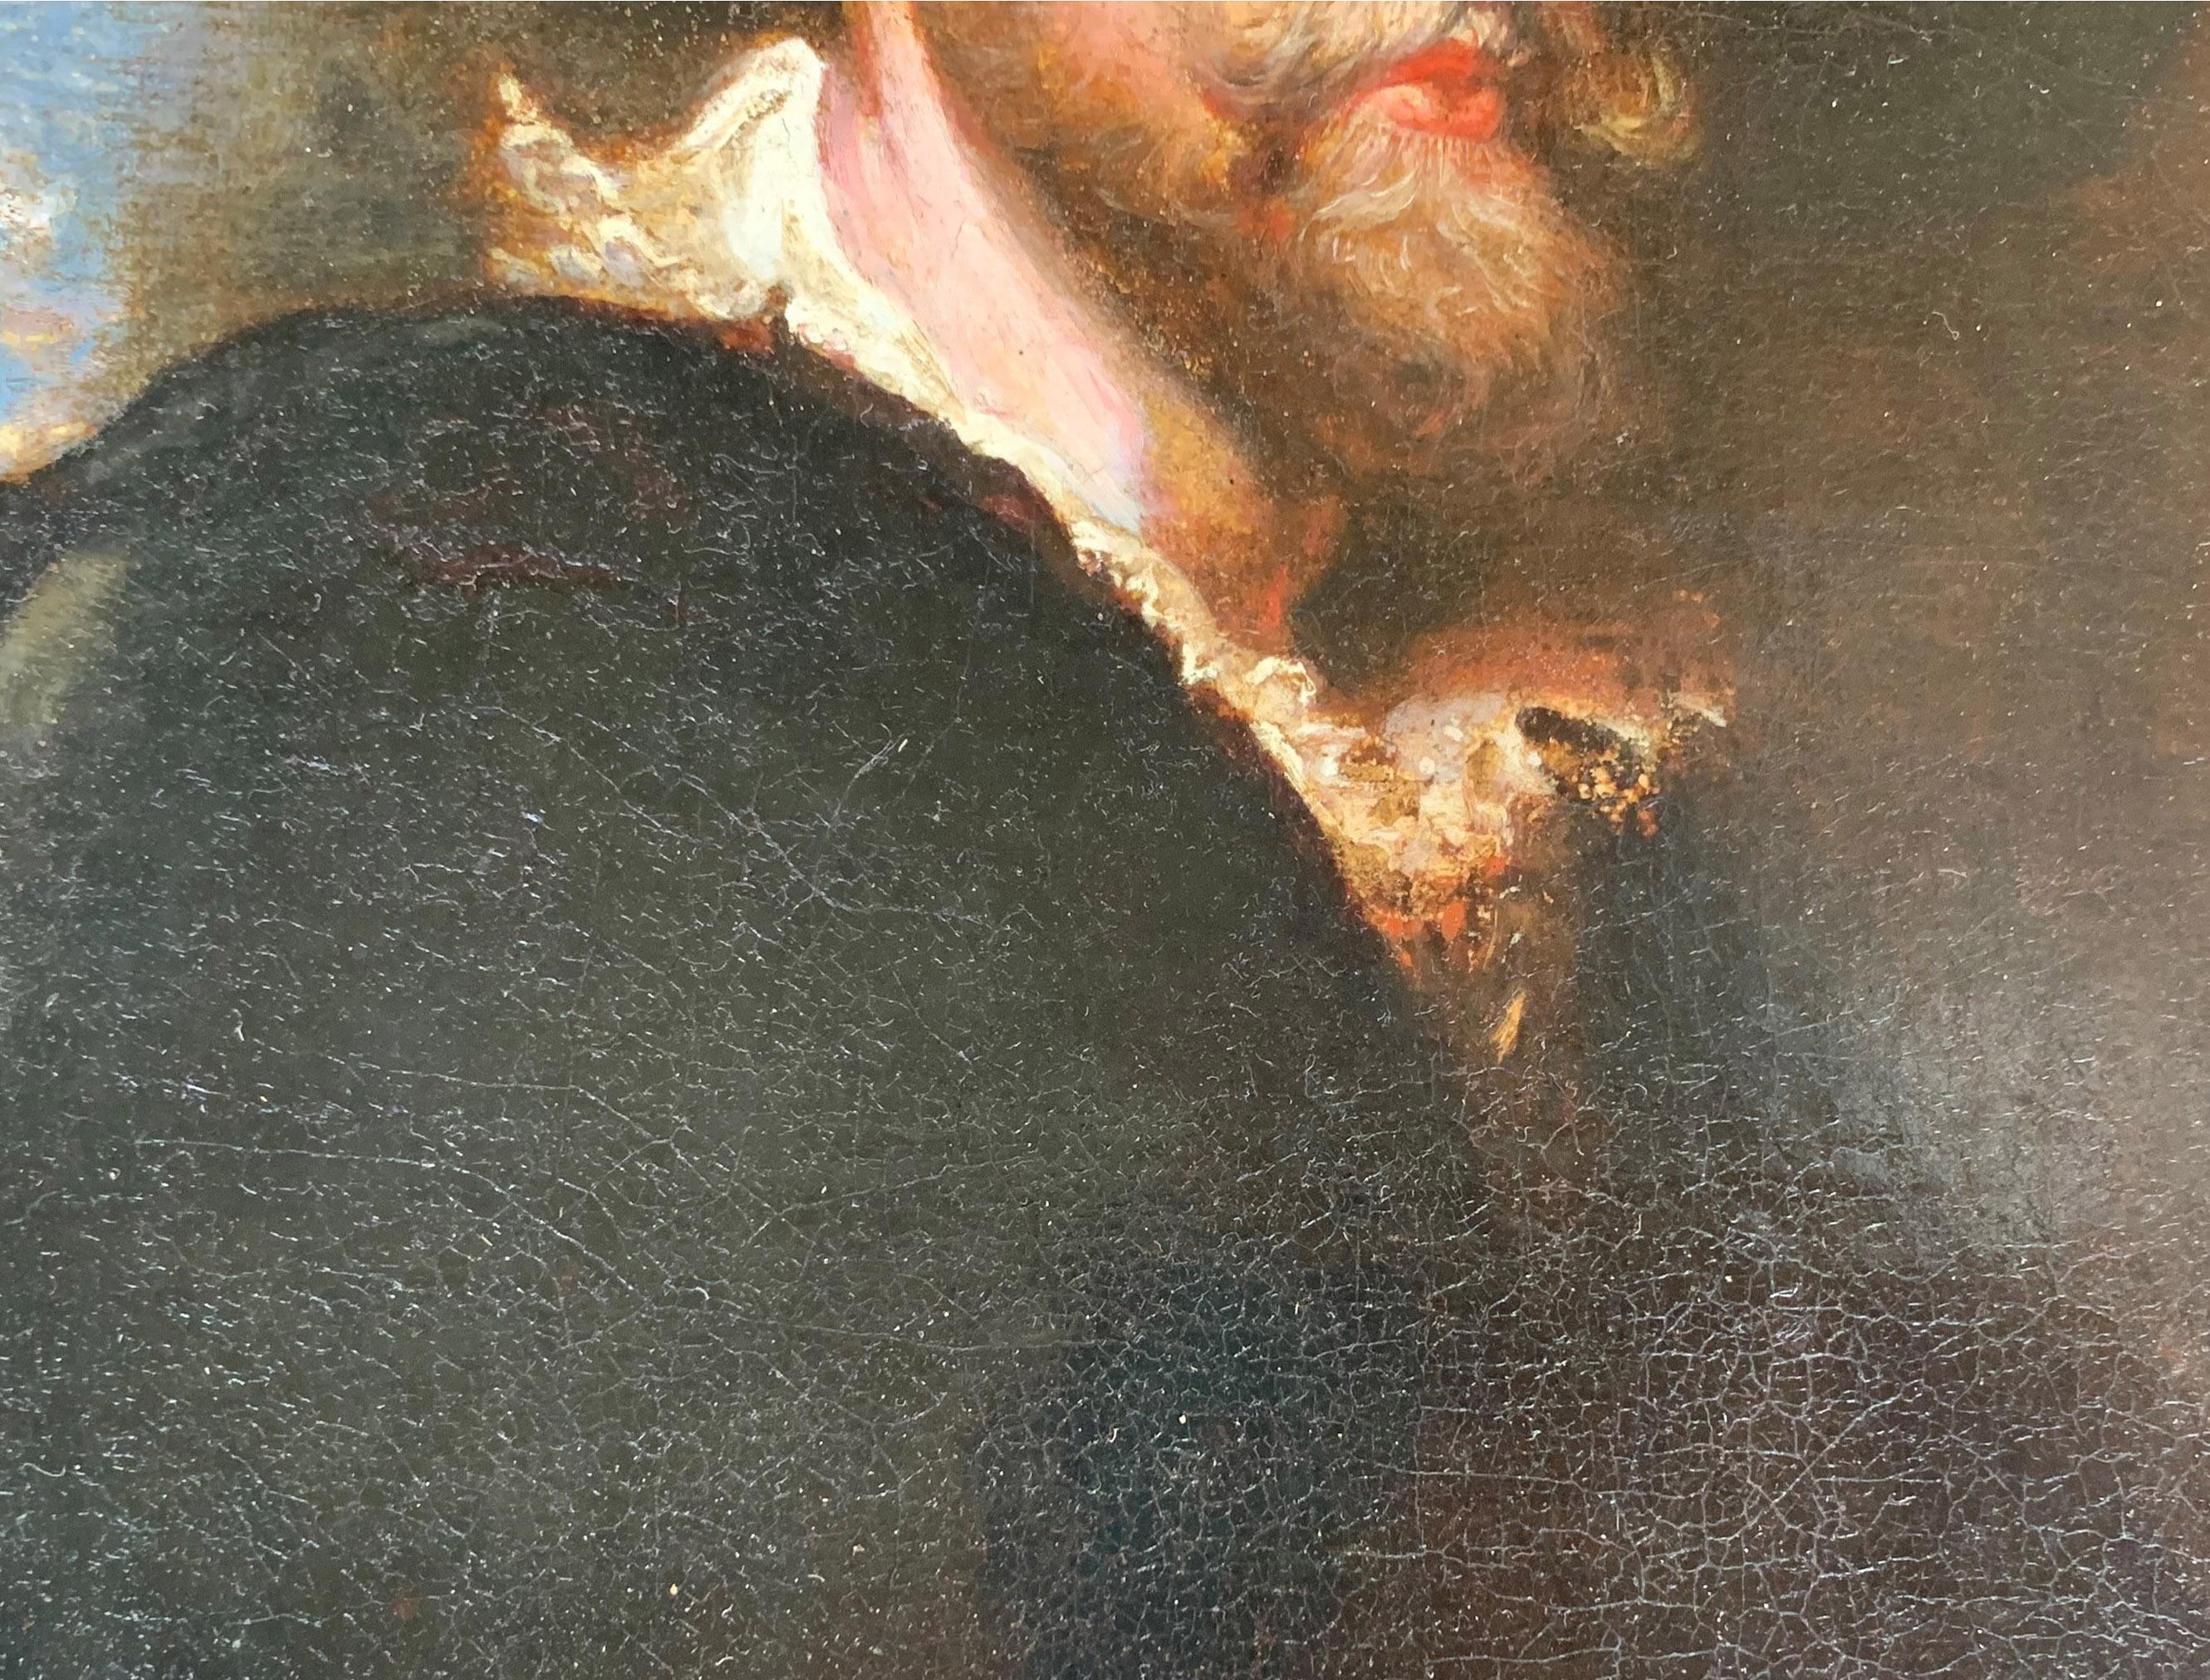 AFTER SIR PETER PAUL RUBENS, SIEGEN, 1577 - 1640, ANTWERP, 17TH CENTURY OIL ON CANVAS Self - Image 9 of 11